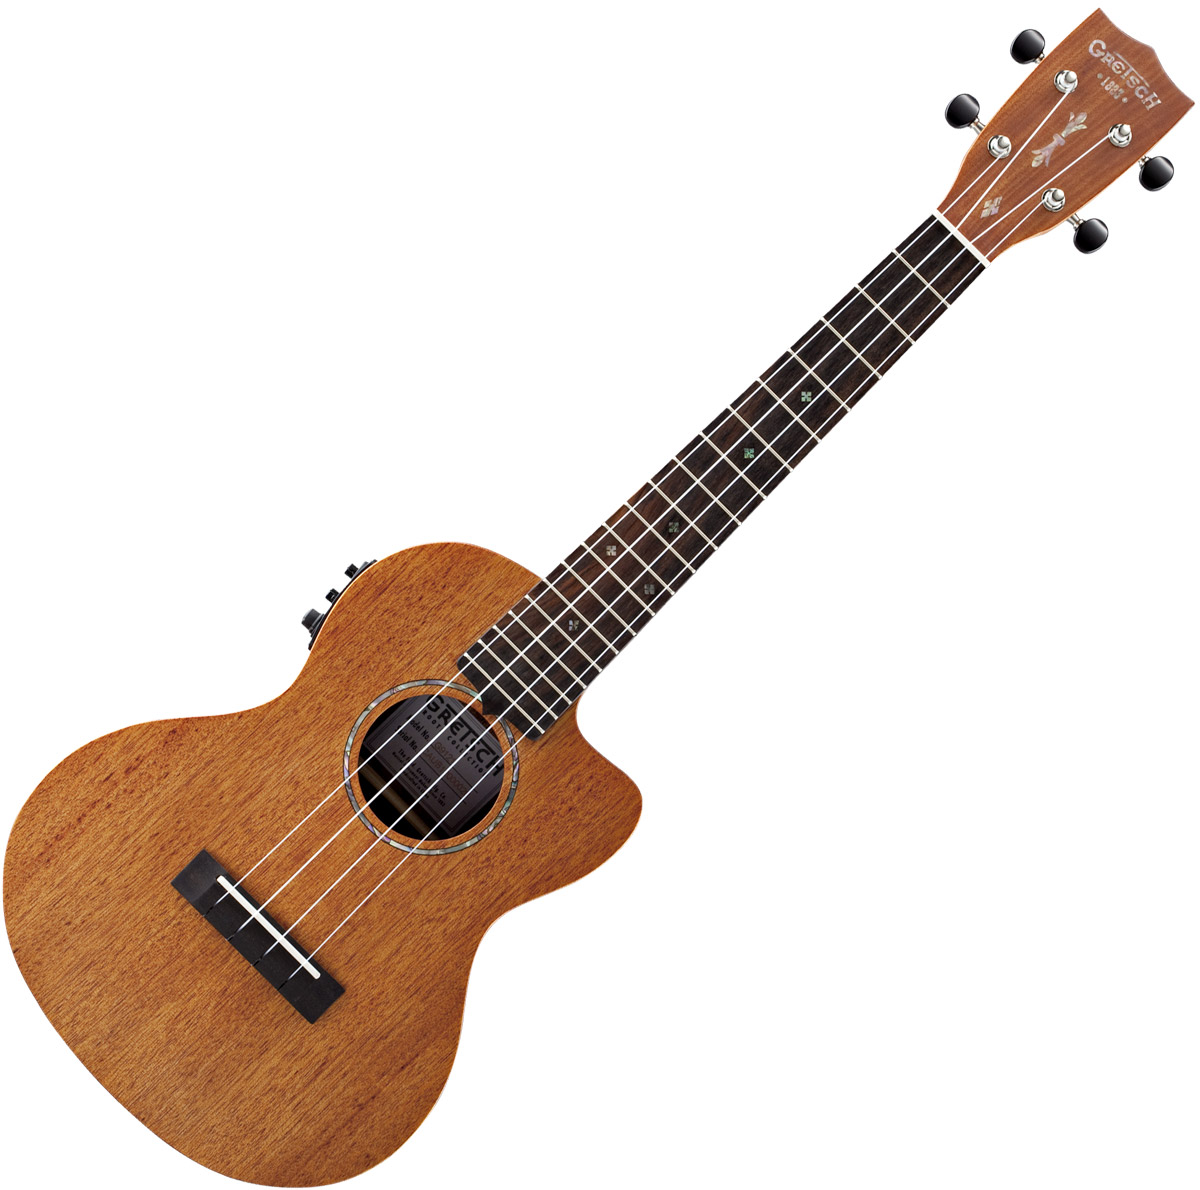 Sampler Instrument - Ukulélé